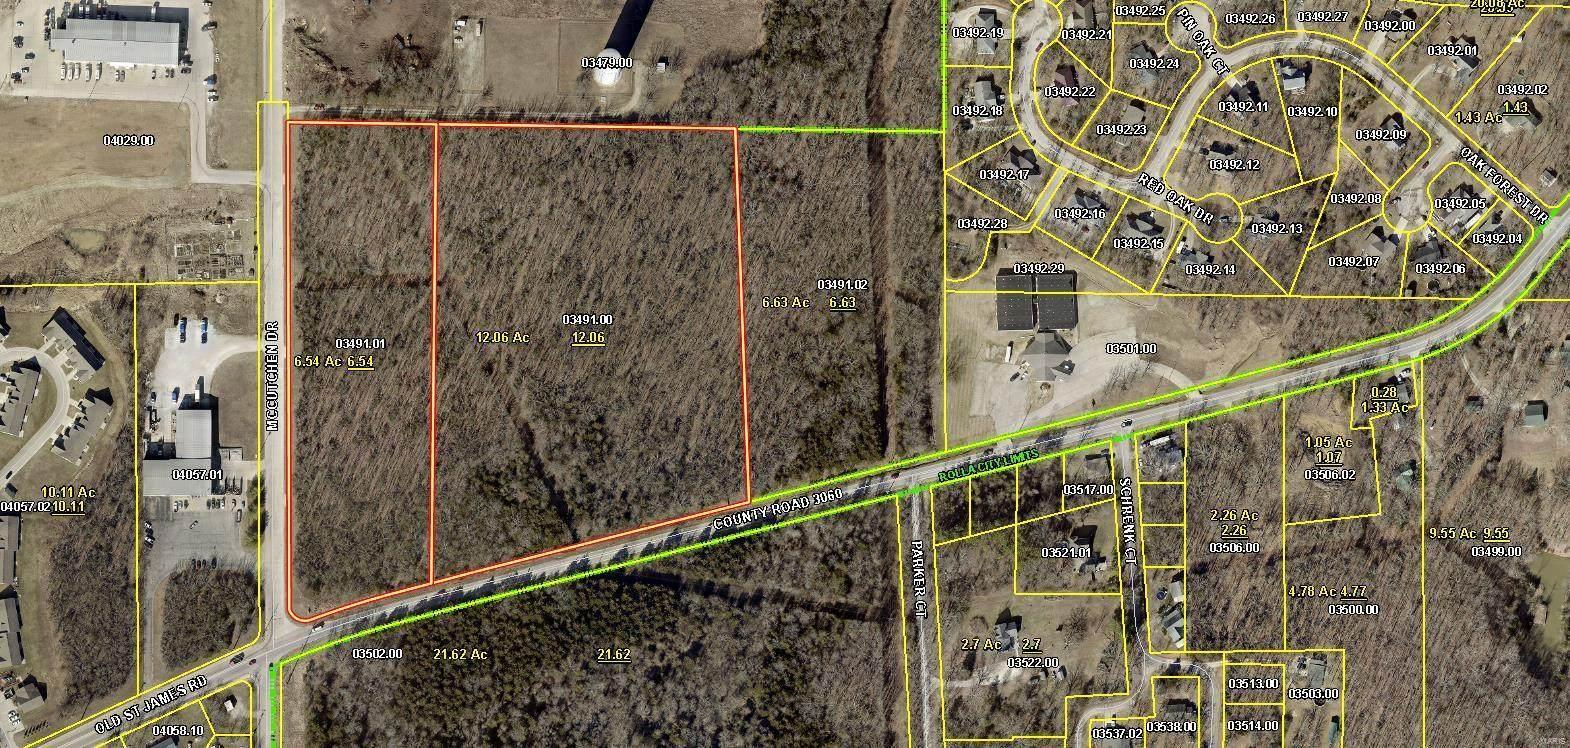 0 Old St James Road/ Cr 3060, Rolla, MO 65401 (#20044741) :: Realty Executives, Fort Leonard Wood LLC